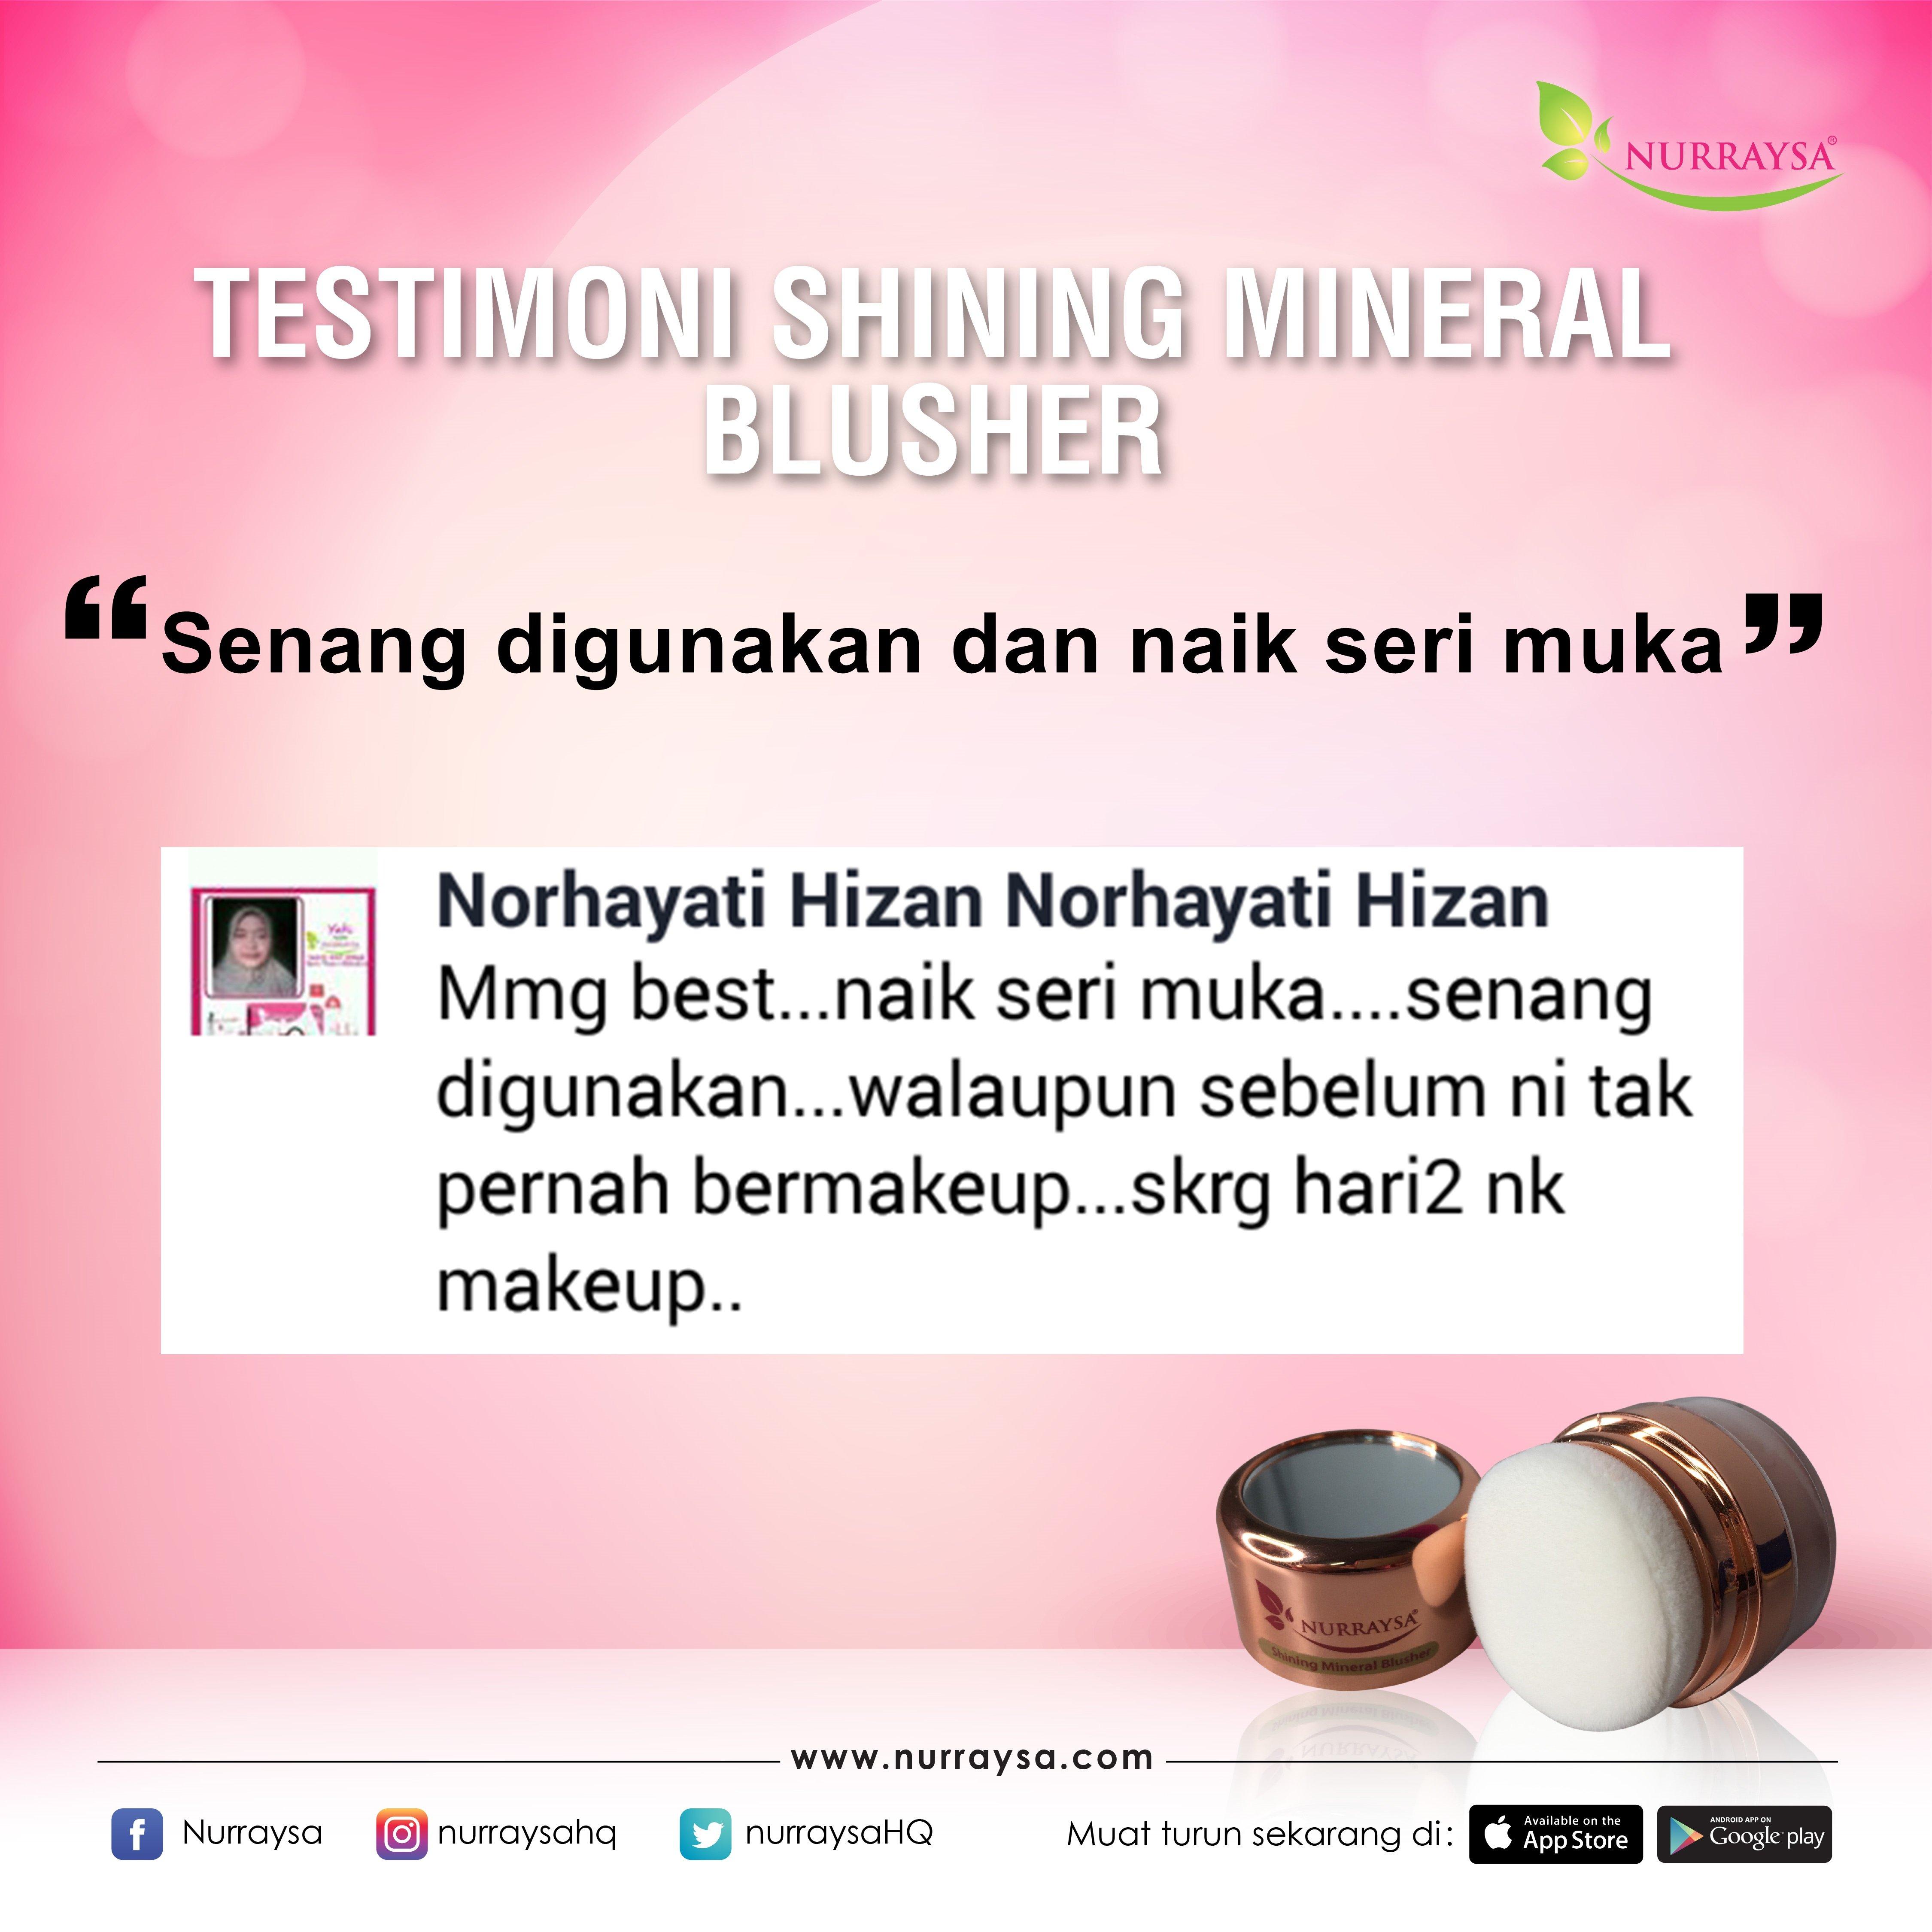 Testimoni Mineral Blusher 7